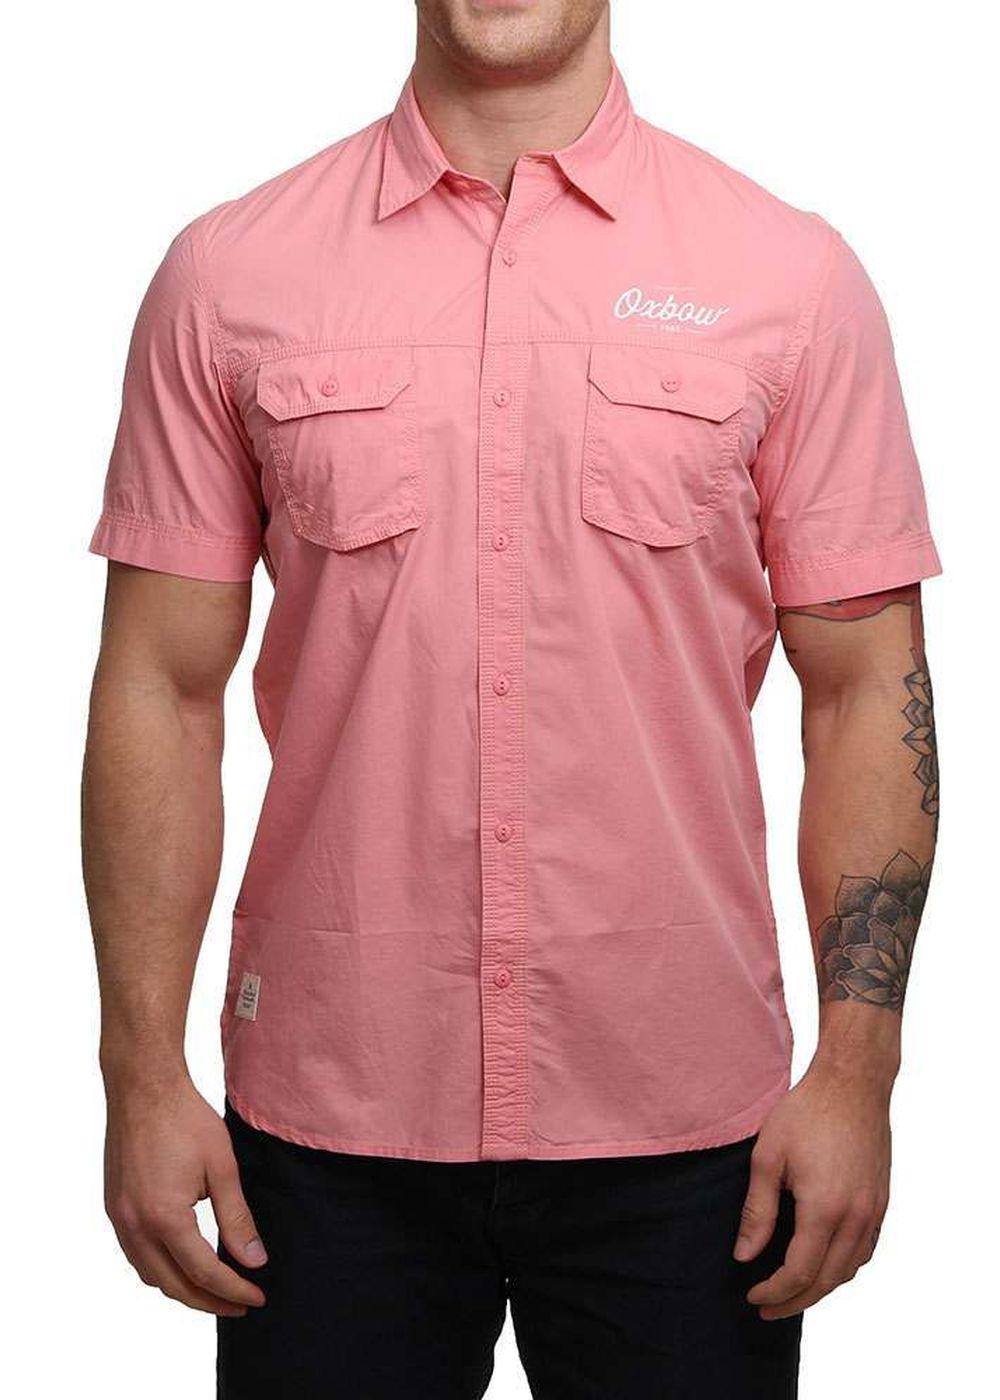 oxbow-calesco-ss-shirt-flamingo